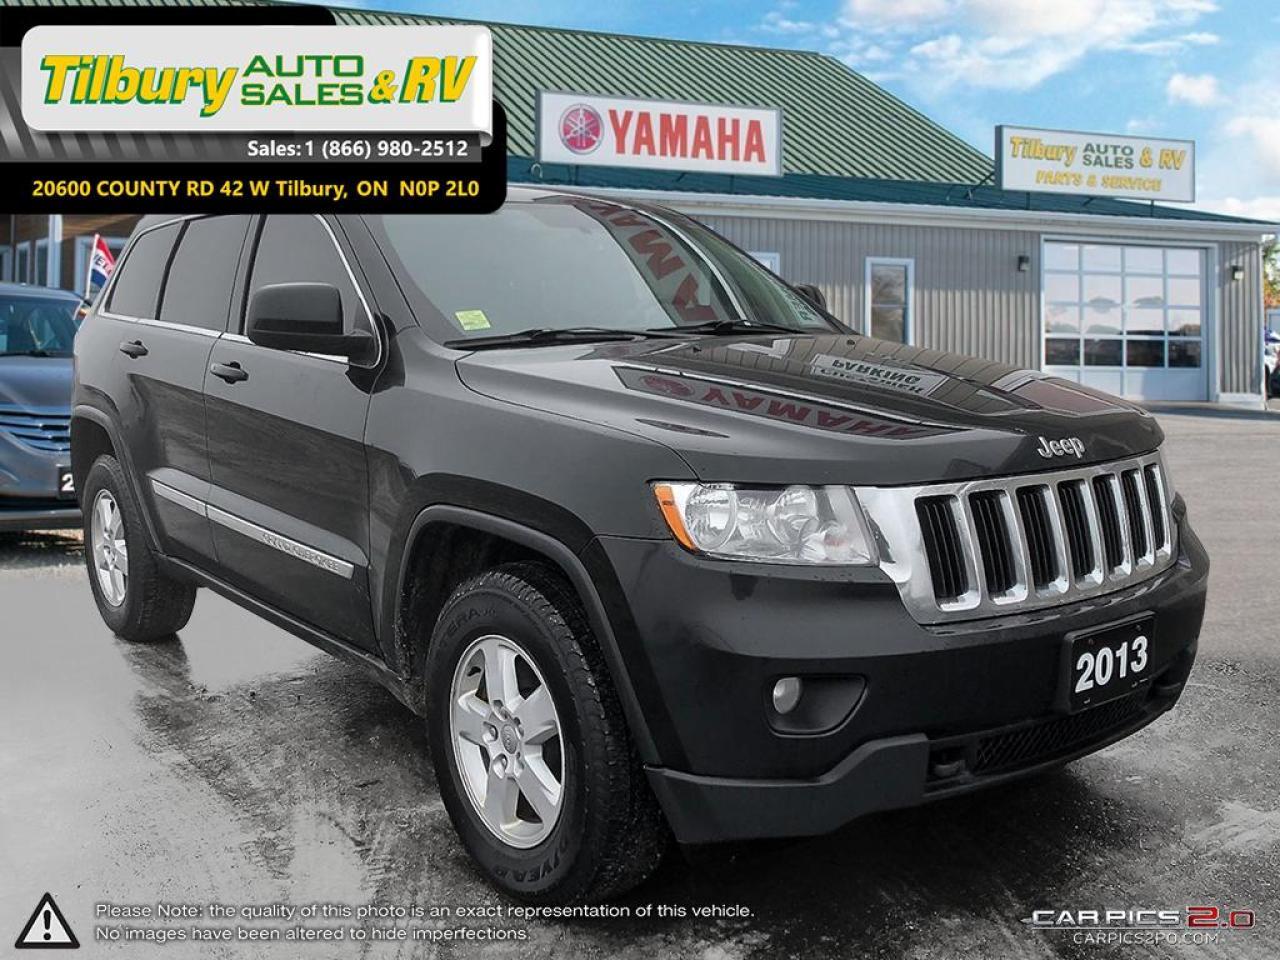 2013 Jeep Grand Cherokee Laredo. *4x4 selec-terrain. Bluetooth. Cruise*